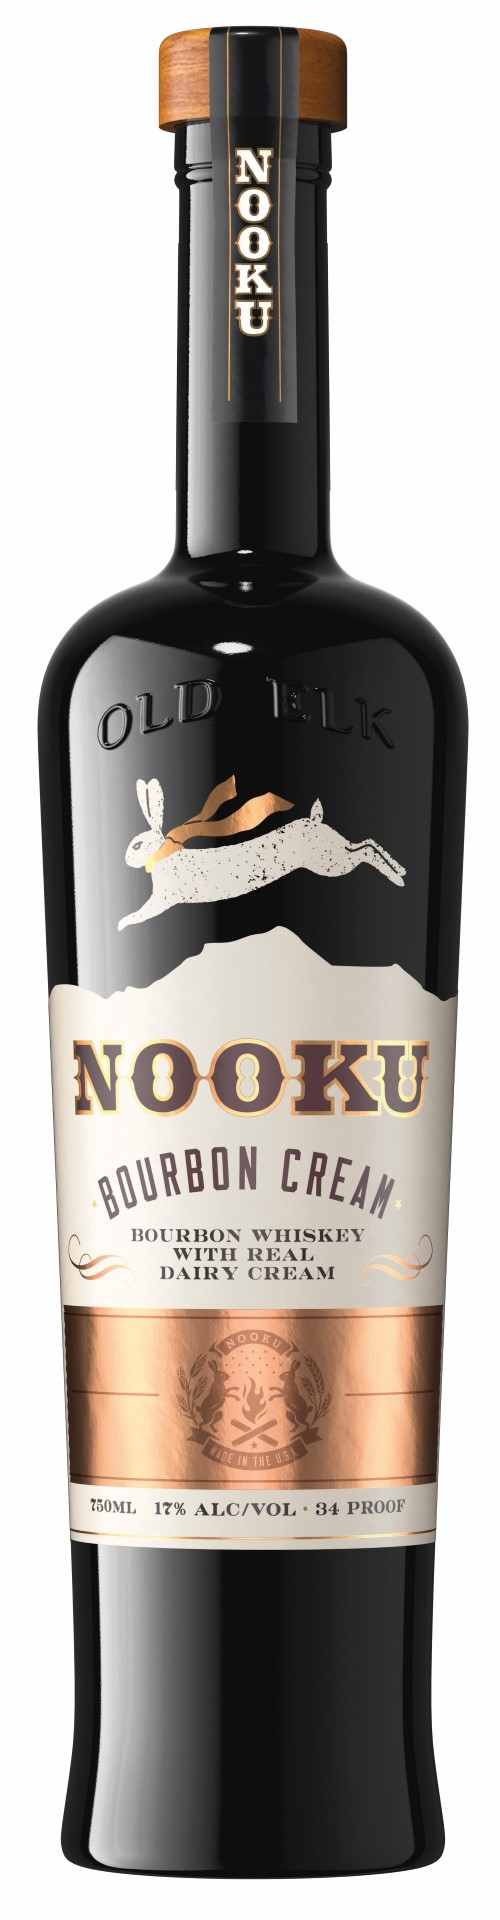 Nooku Bourbon Cream